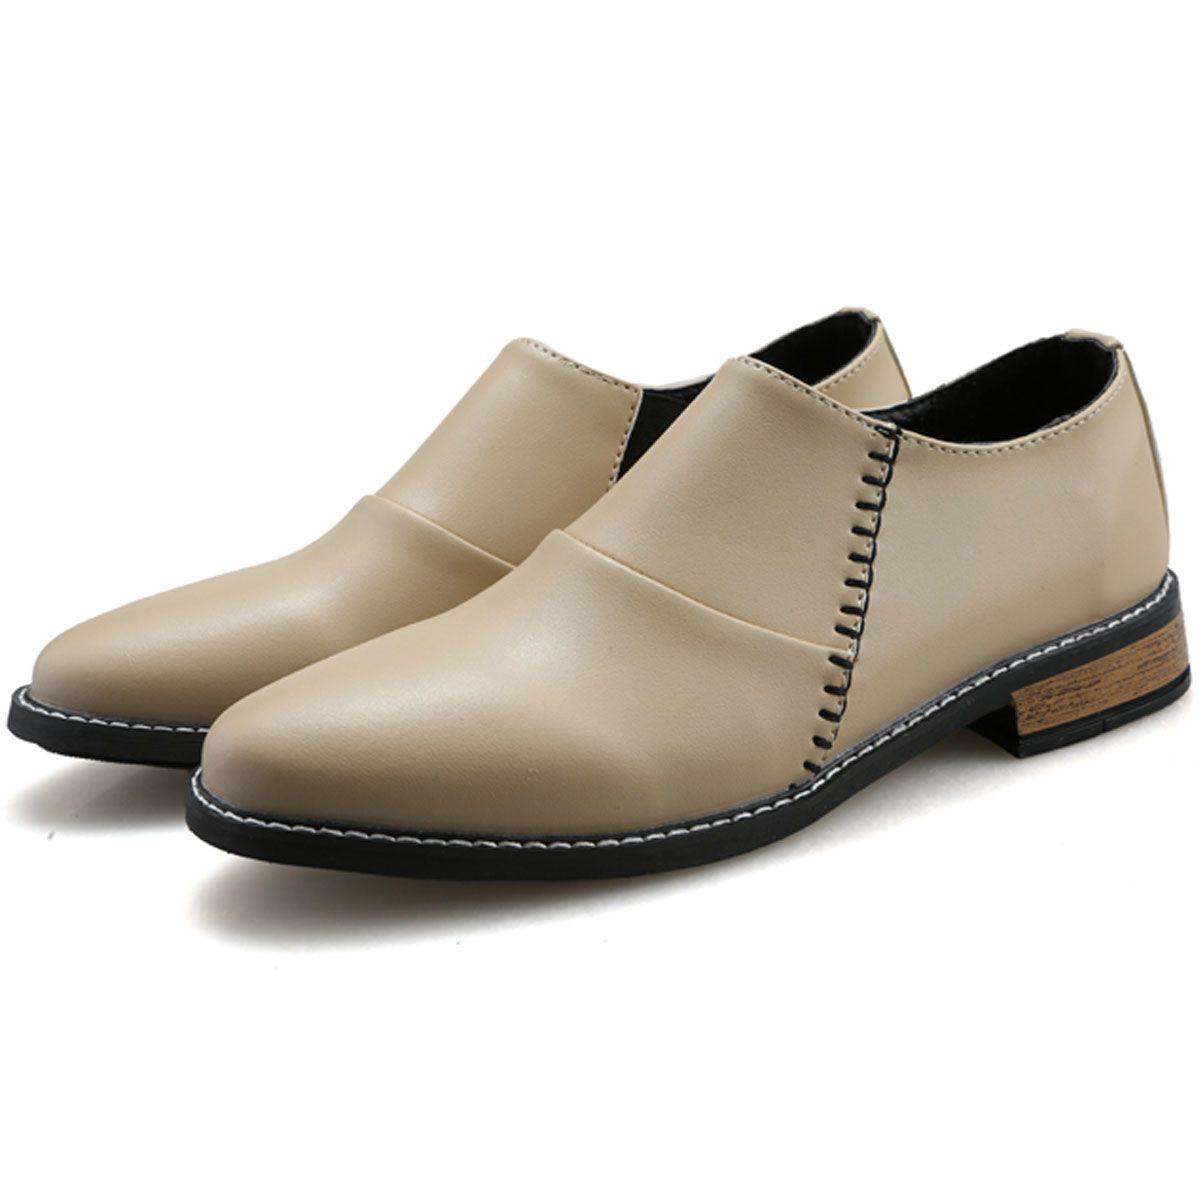 Elegant Stylish Italian Leather Mens Dress Shoes Slim Slip On ...